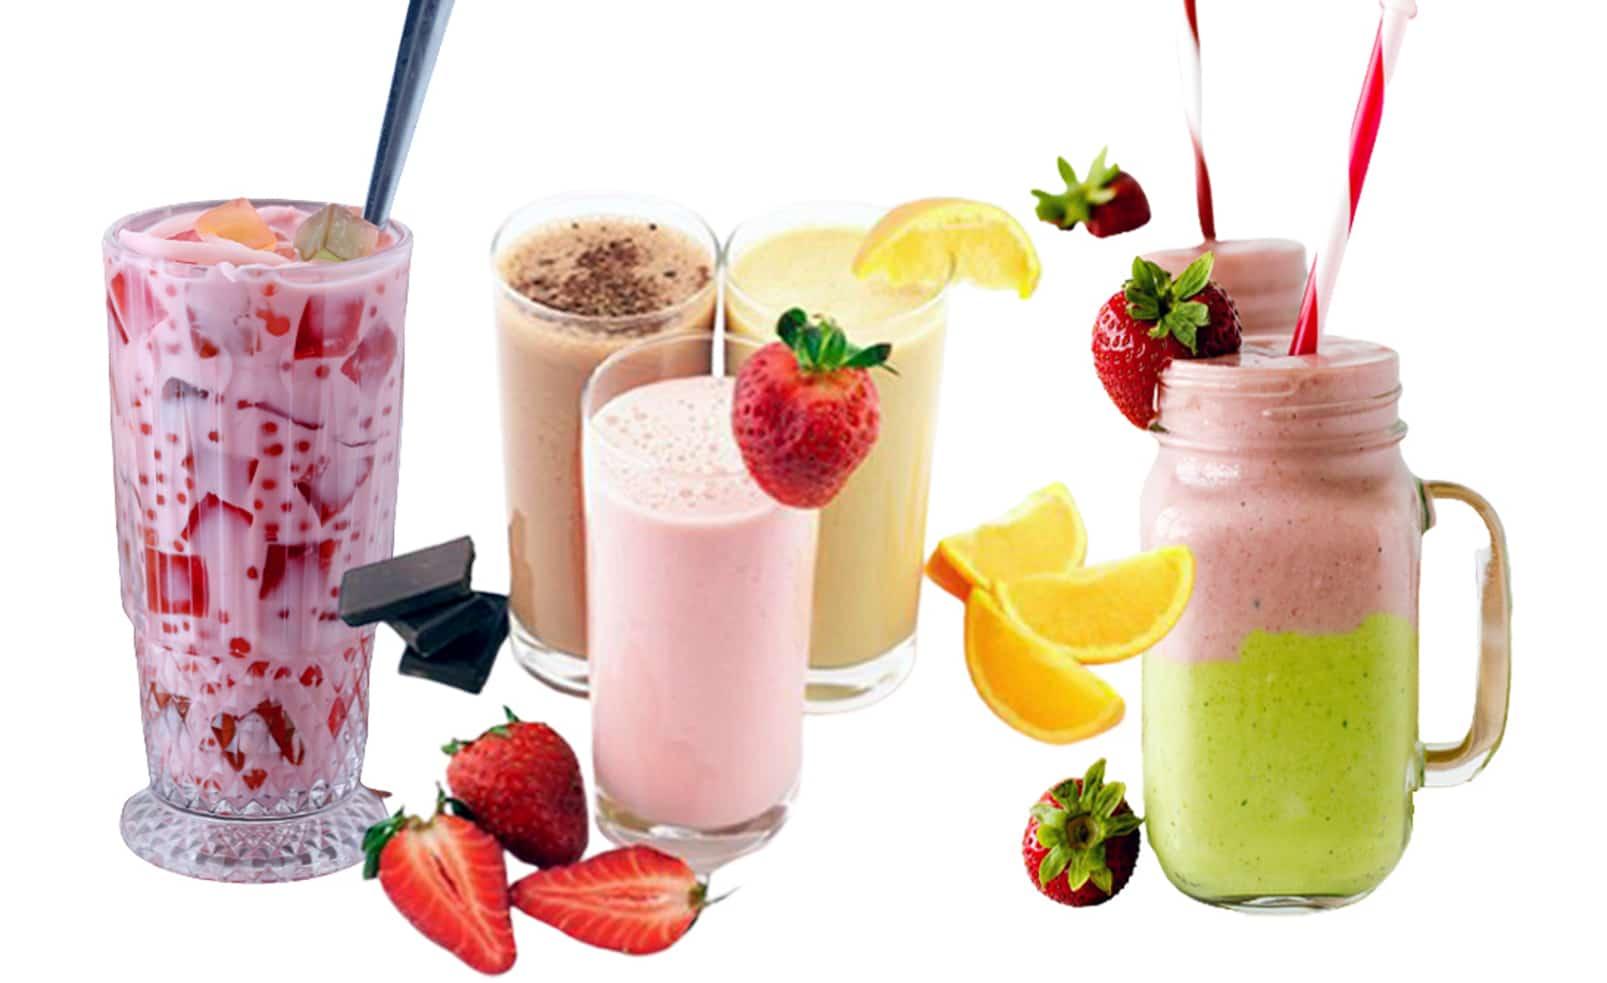 Shaker Bottle Recipes To Drink Diet